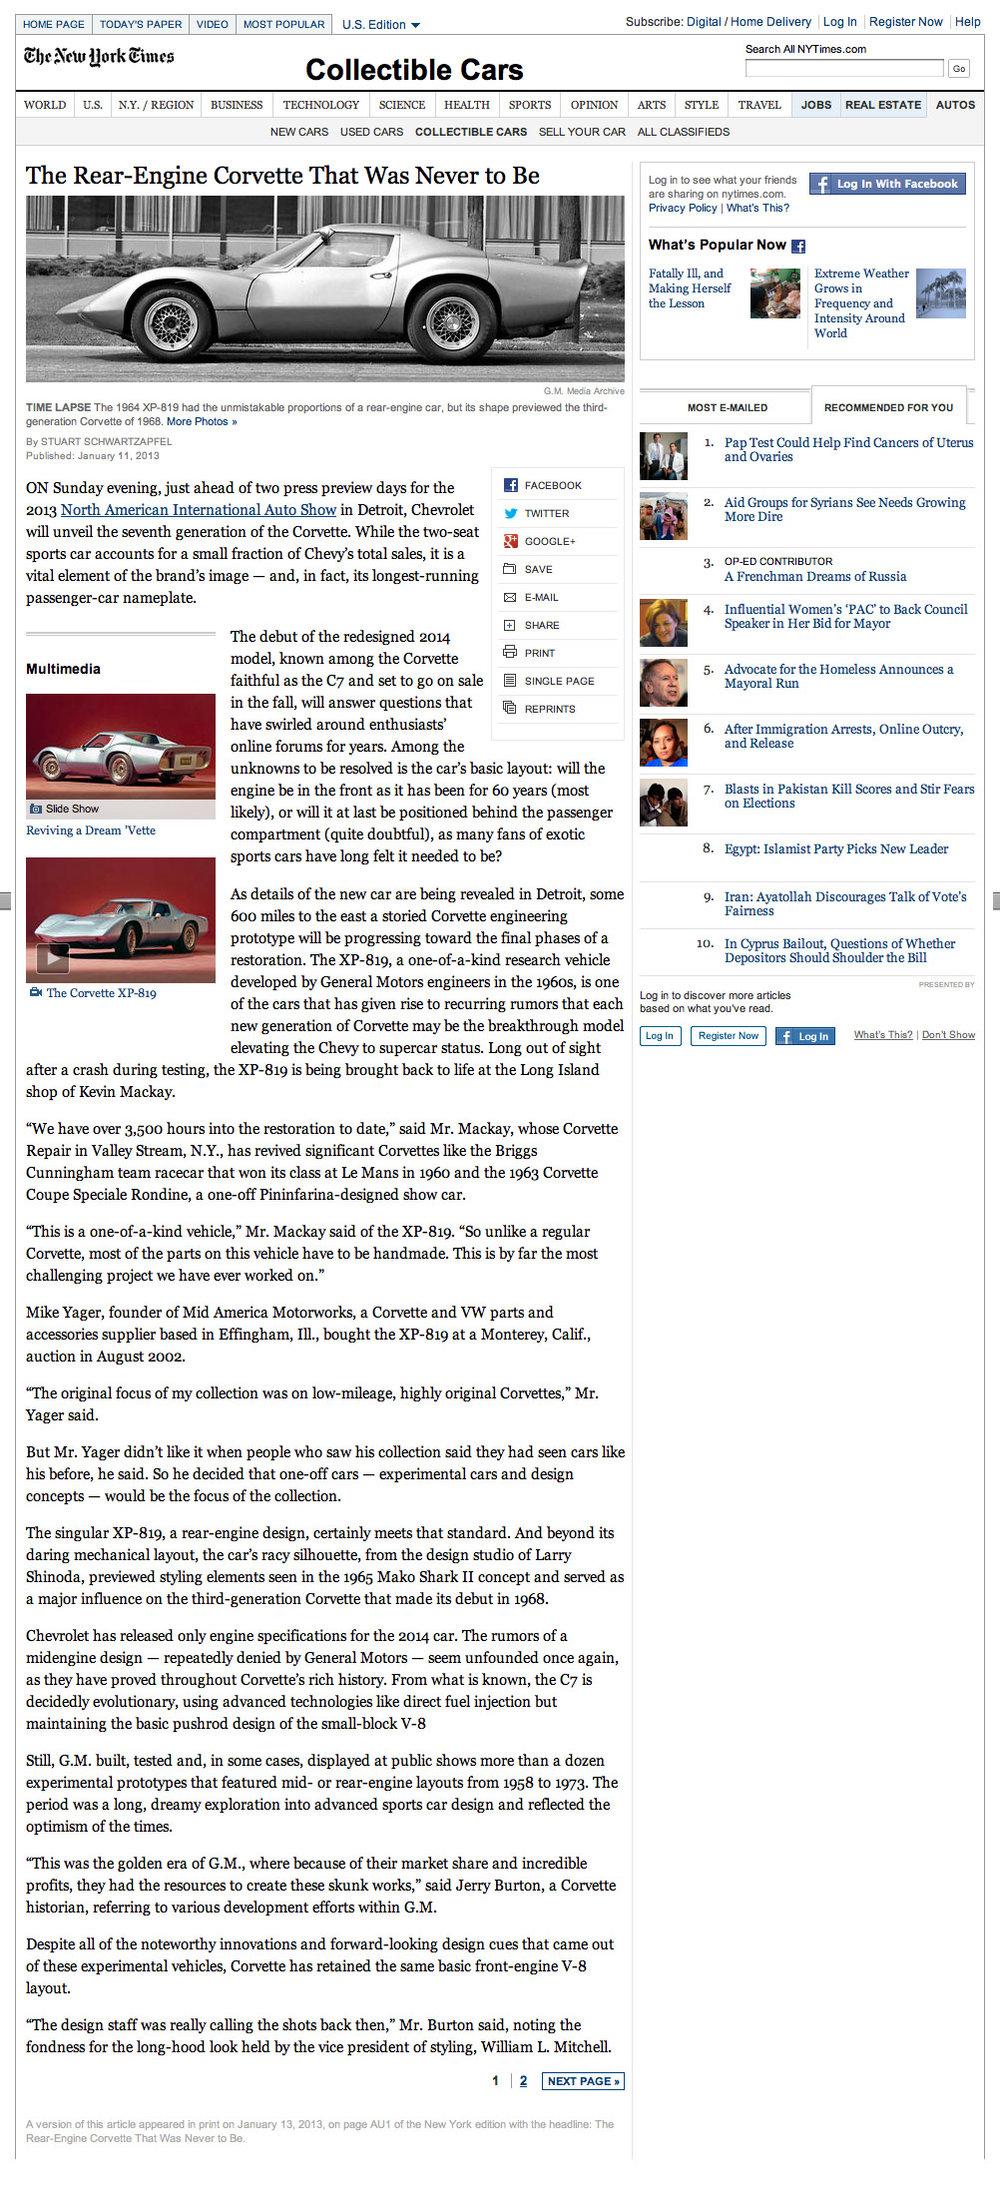 NYTimesXP819Page1.jpg